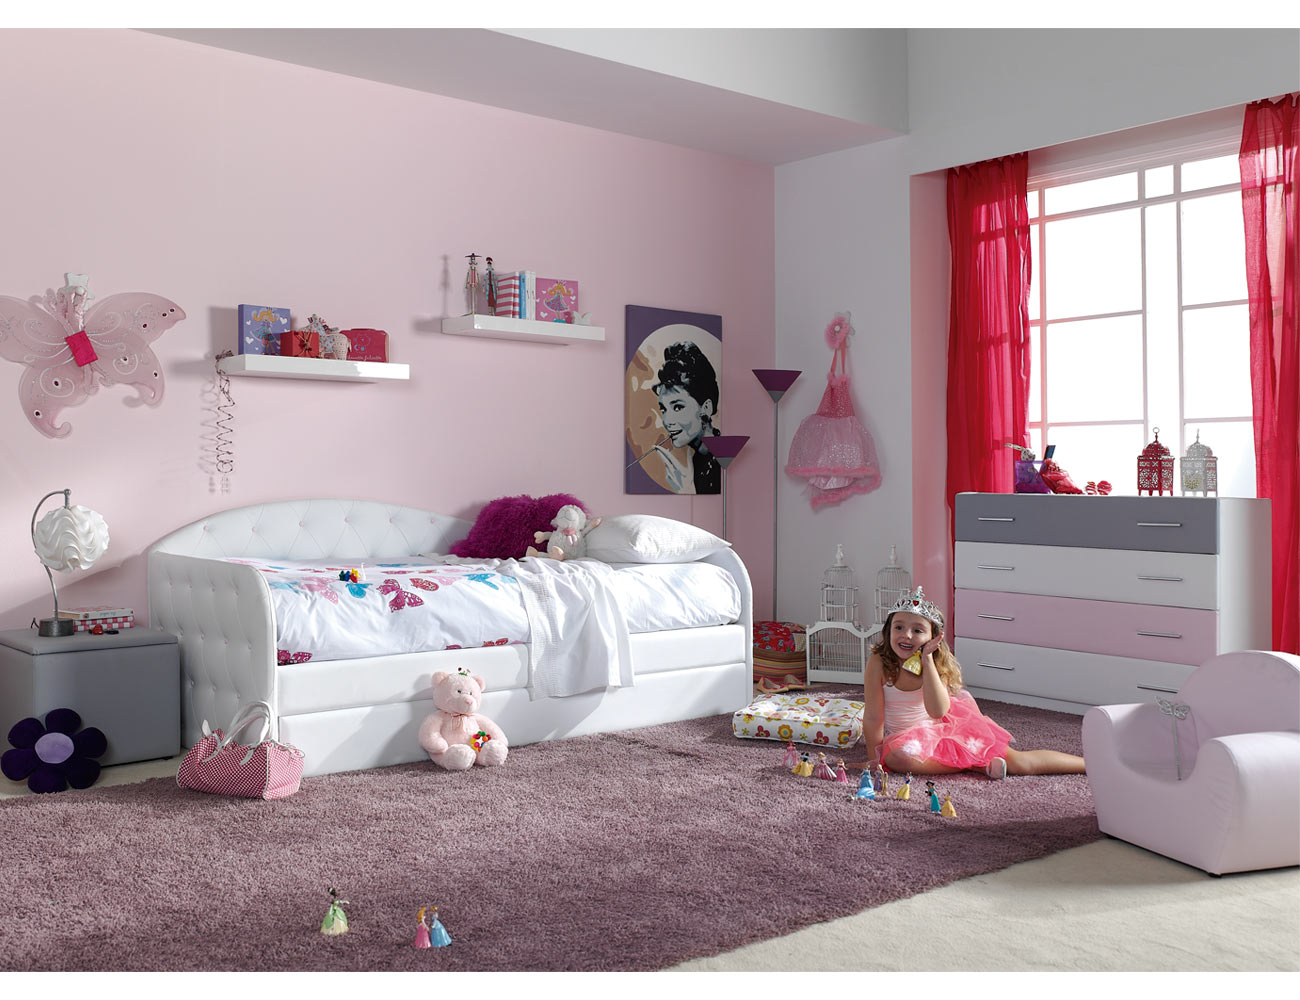 243 cama nido6